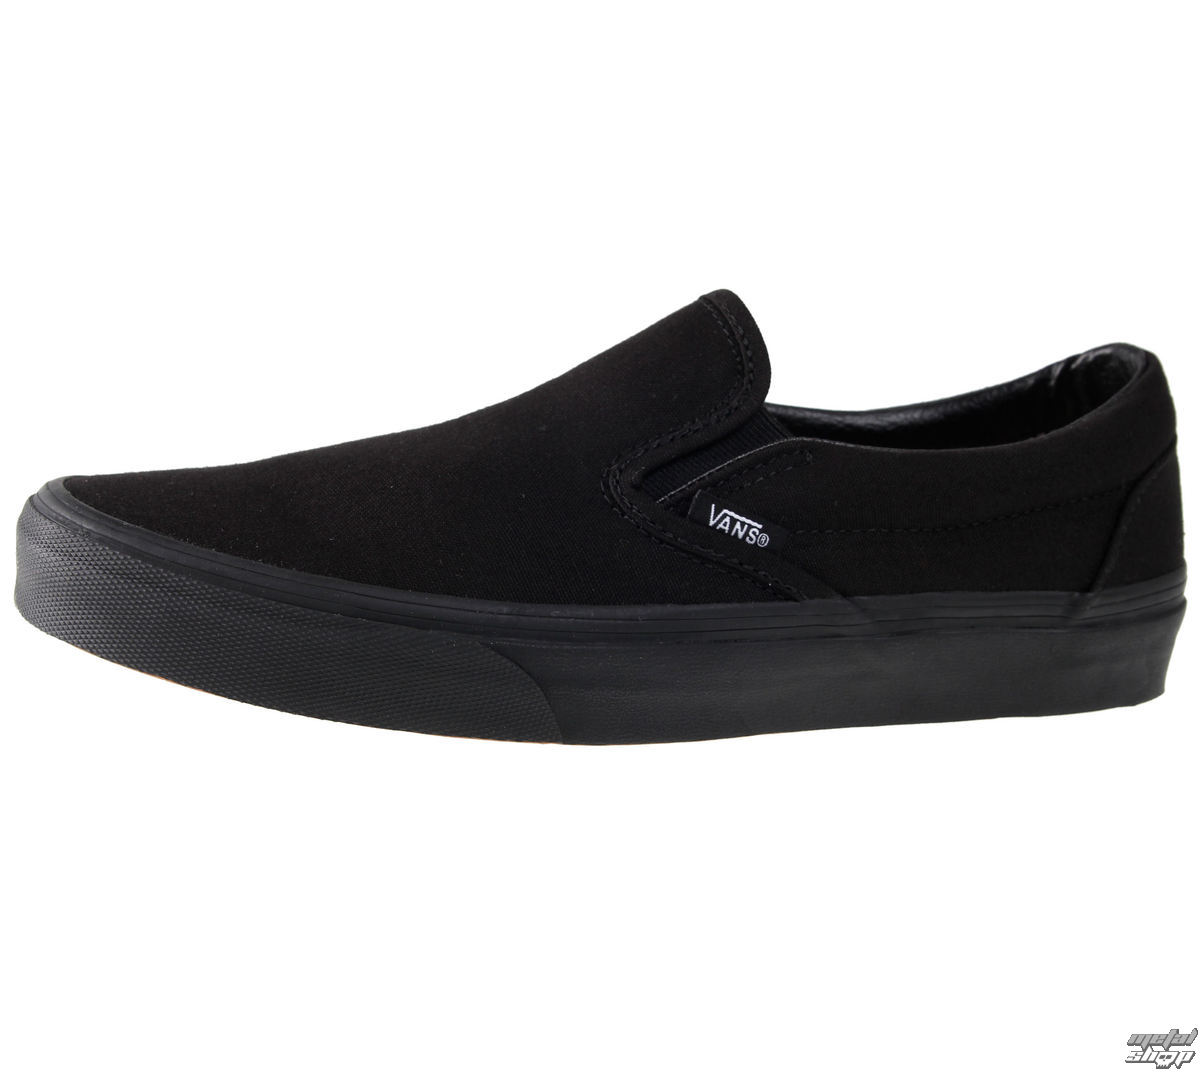 topánky pánske VANS - CLASSIC SLIP-ON - Black / Black - VEYEBKA